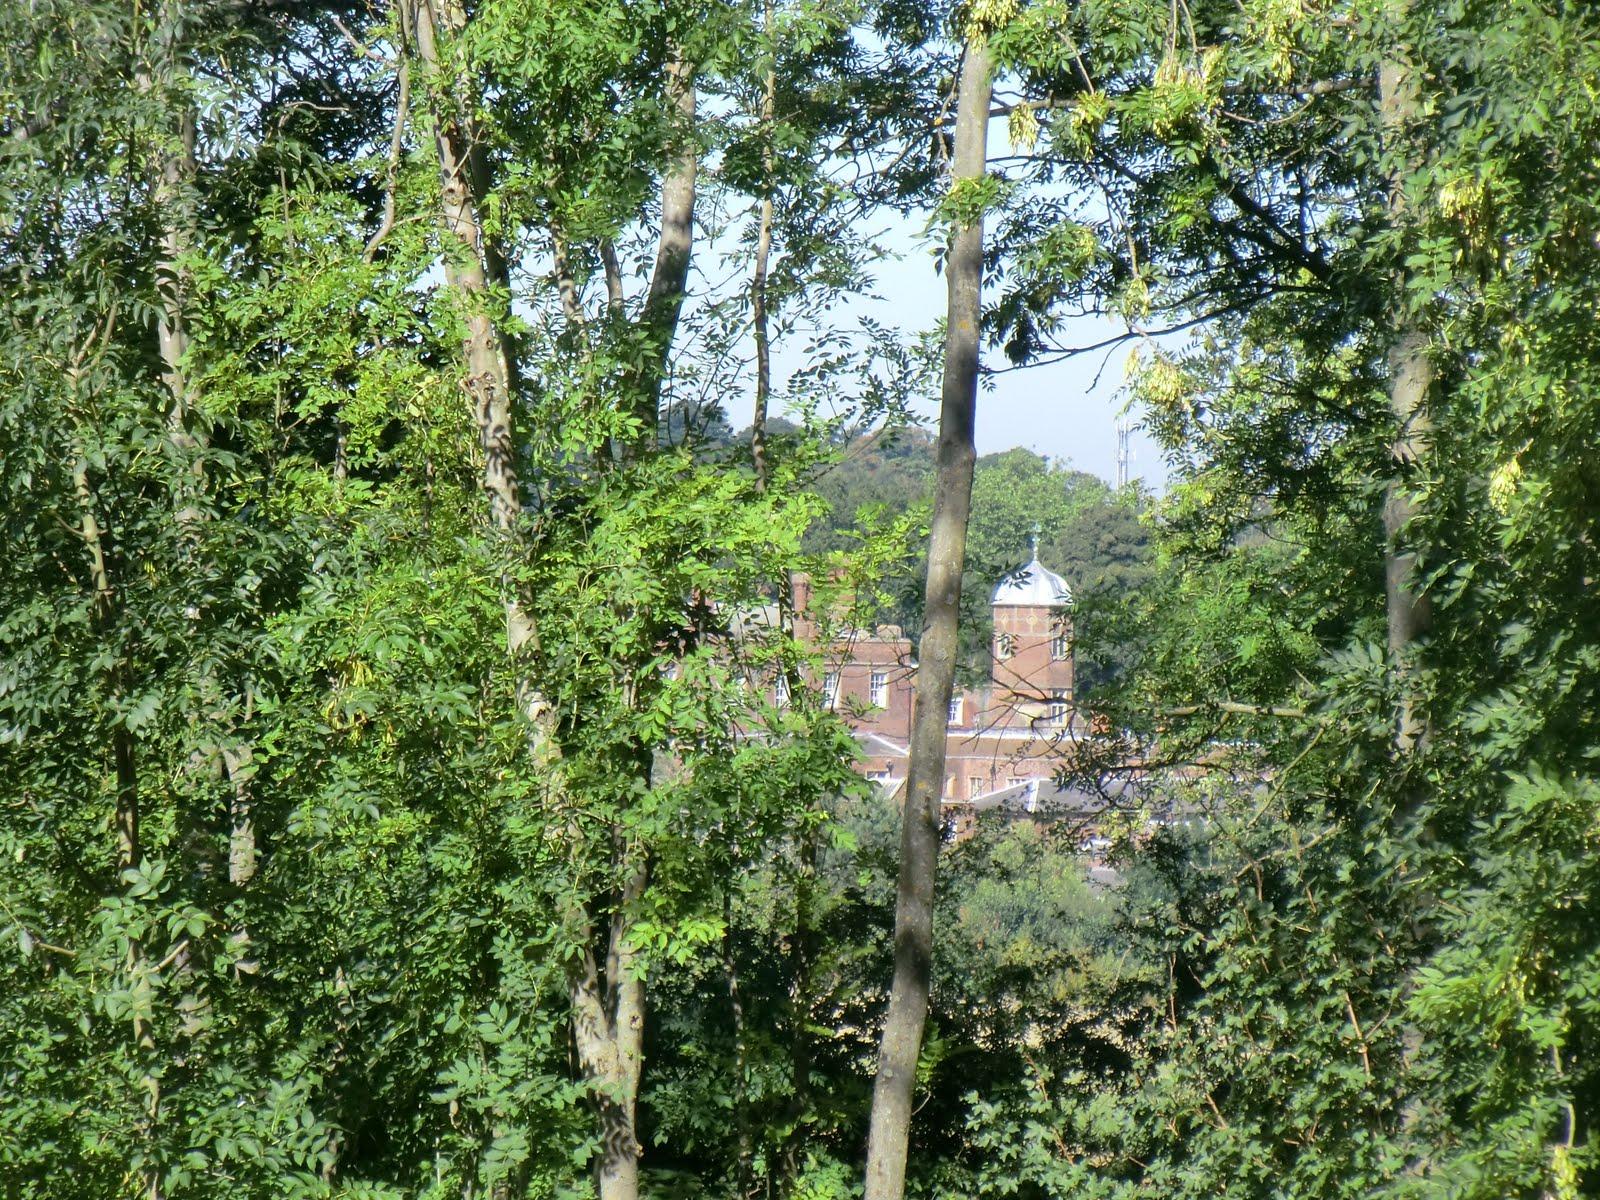 CIMG3875 Cobham Hall through the trees